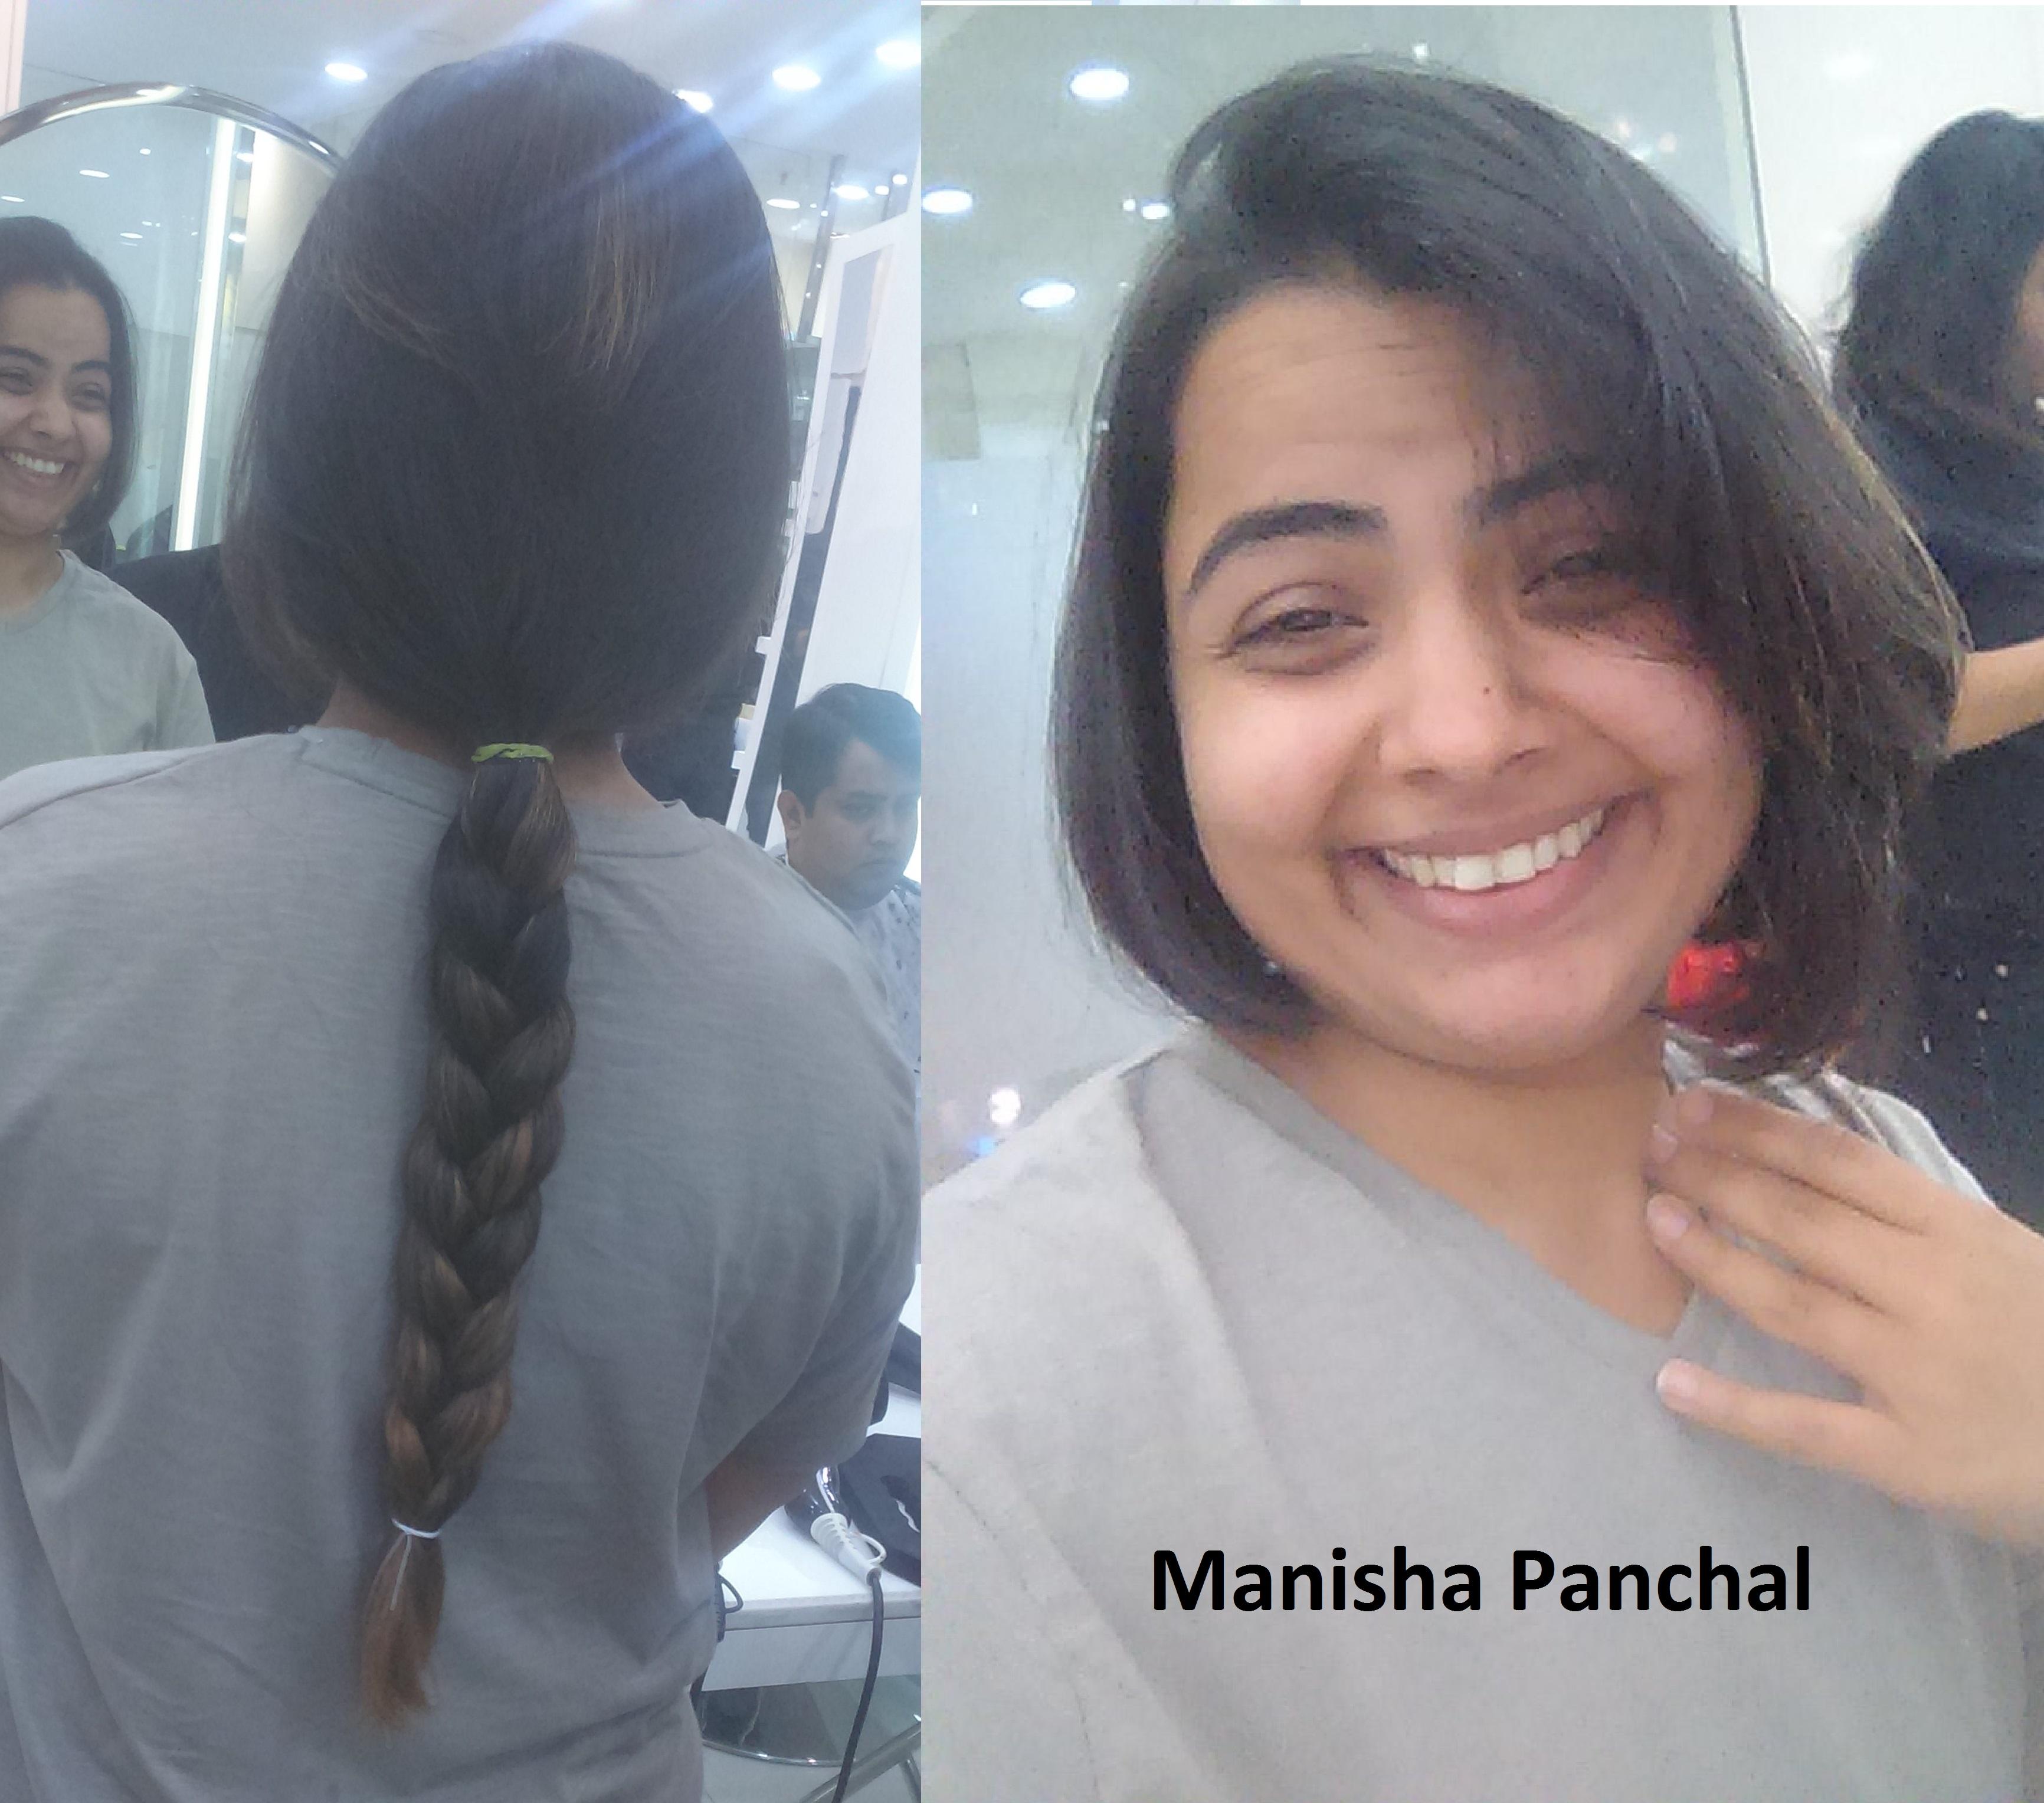 Manisha Panchal